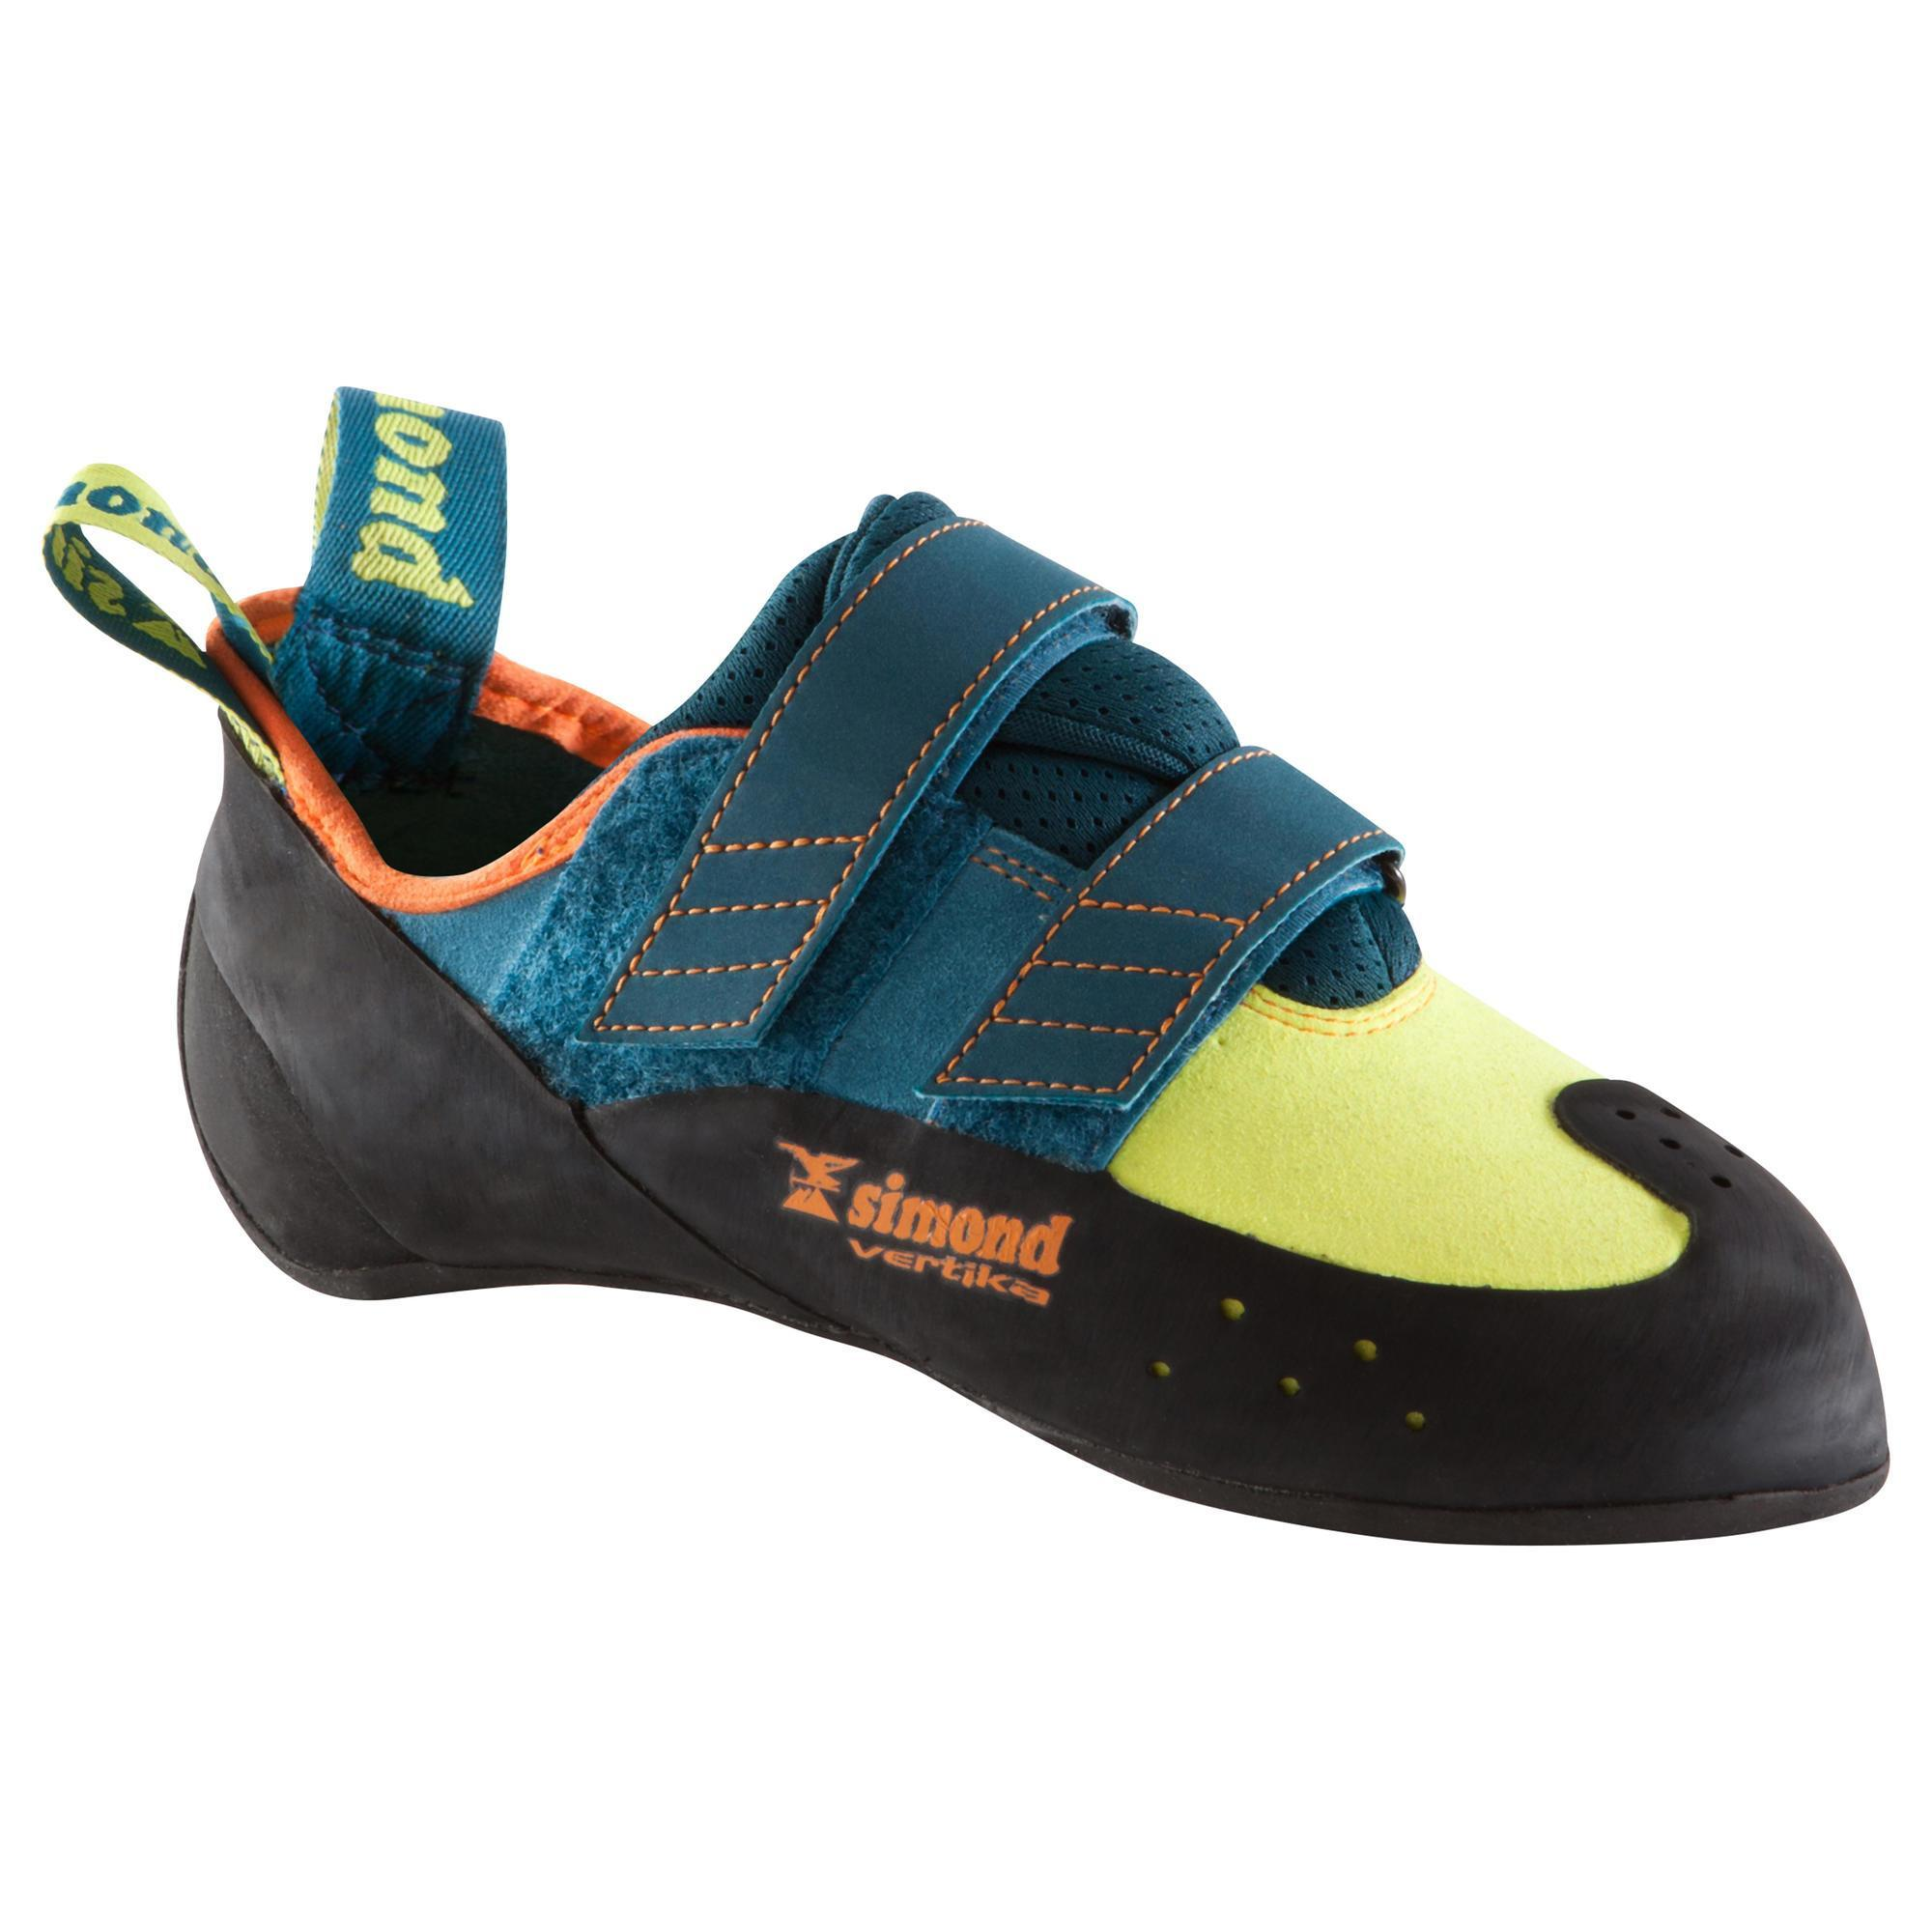 Kletterschuhe Vertika Erwachsene | Schuhe > Outdoorschuhe > Kletterschuhe | Blau - Türkis - Grün - Orange | Gummi - Leder | Simond